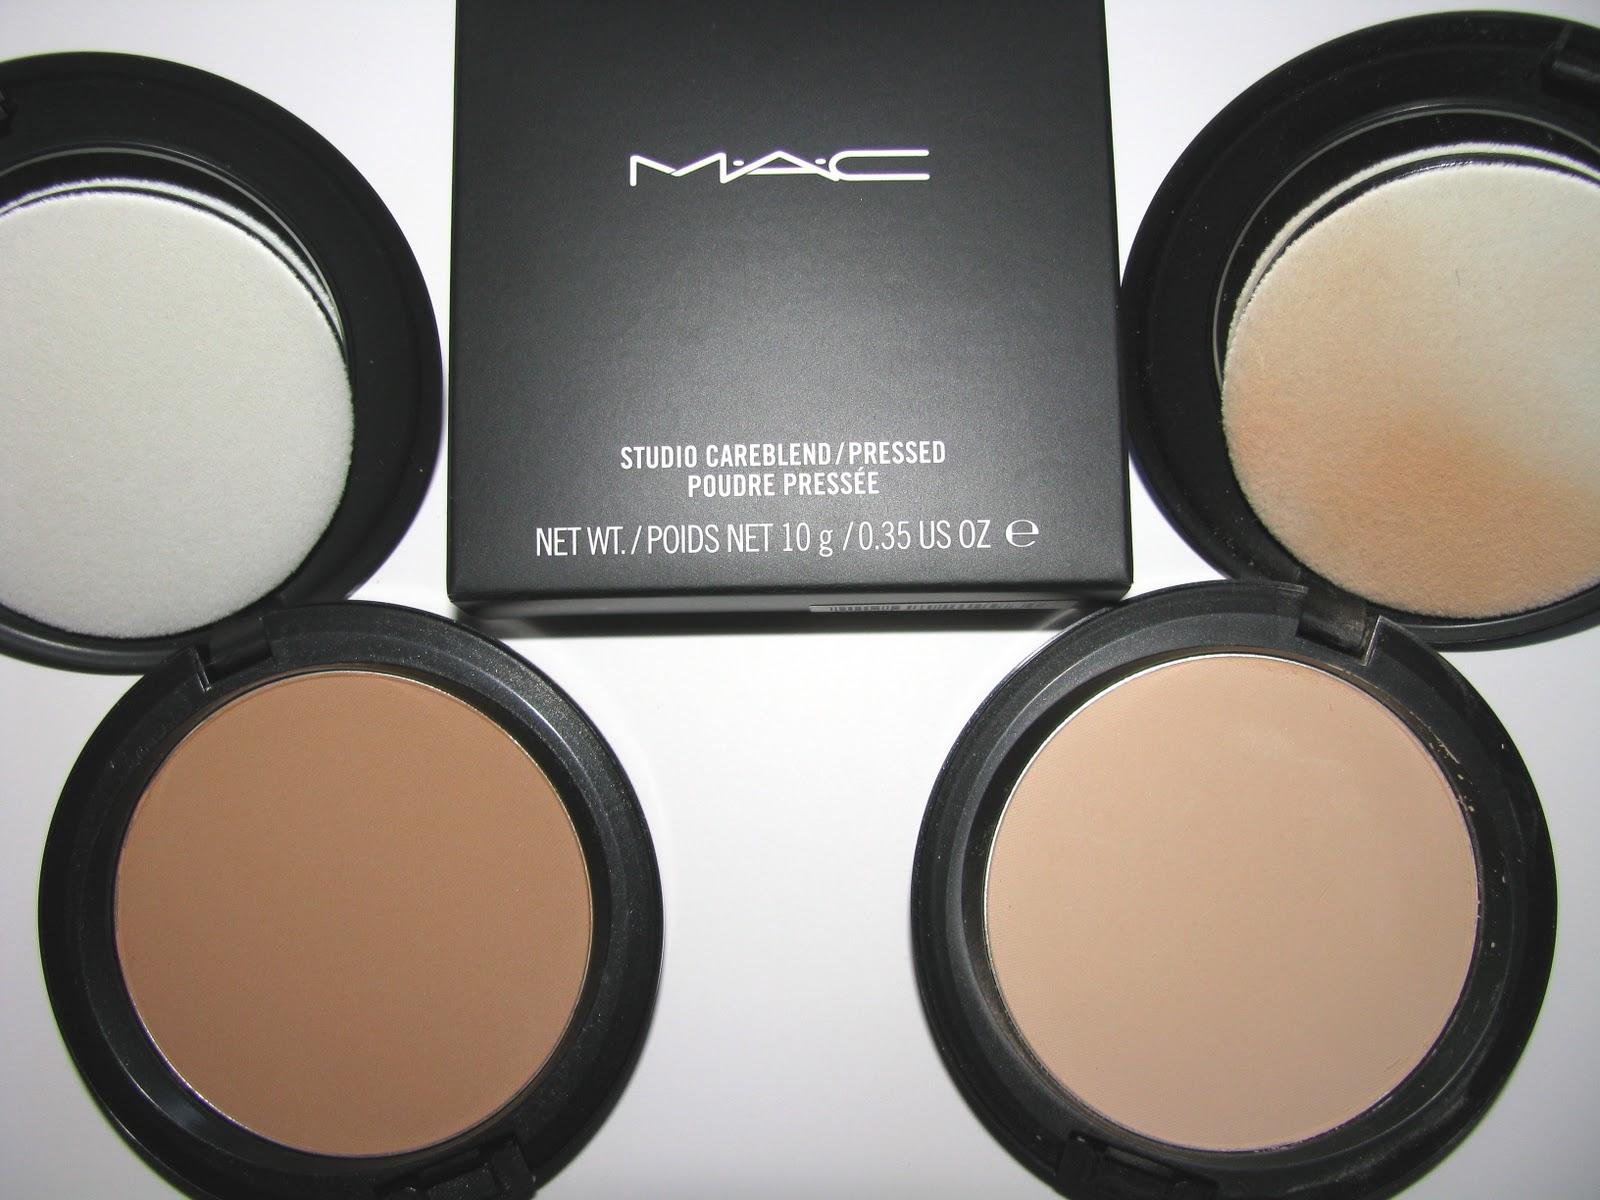 Beauty Blogs: MAC Studio Careblend Pressed Powder